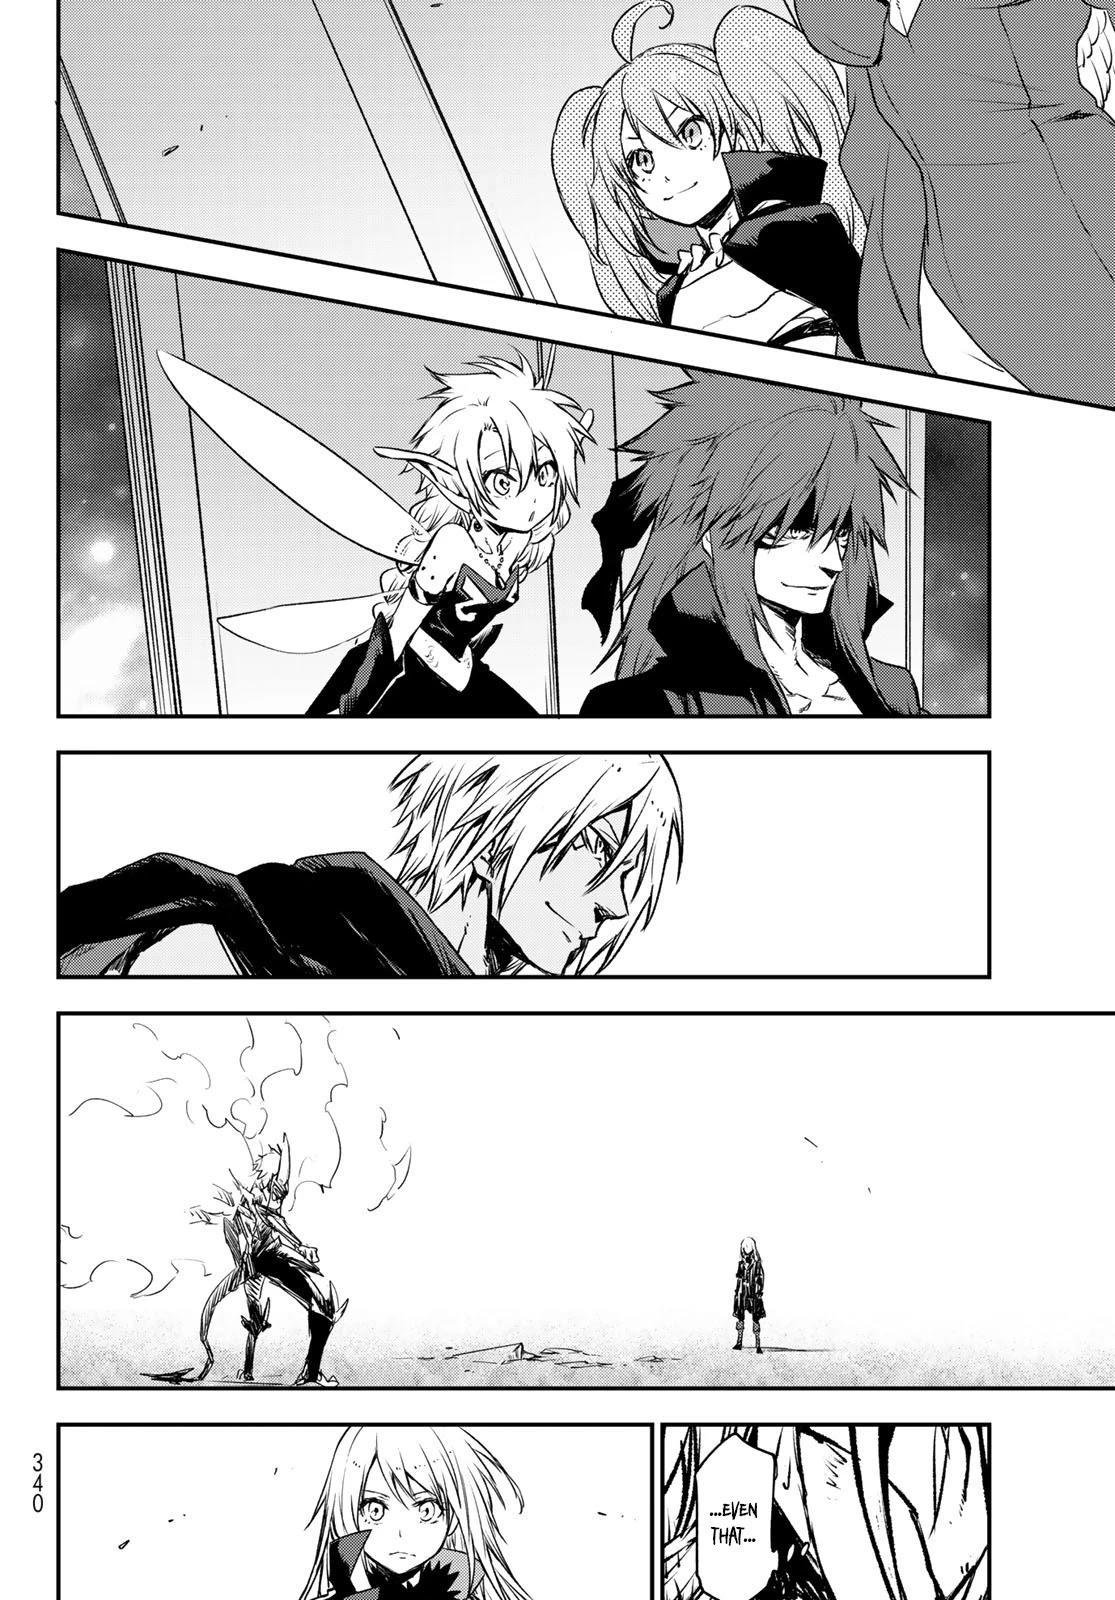 Tensei Shitara Slime Datta Ken Chapter 85 page 12 - Mangakakalots.com